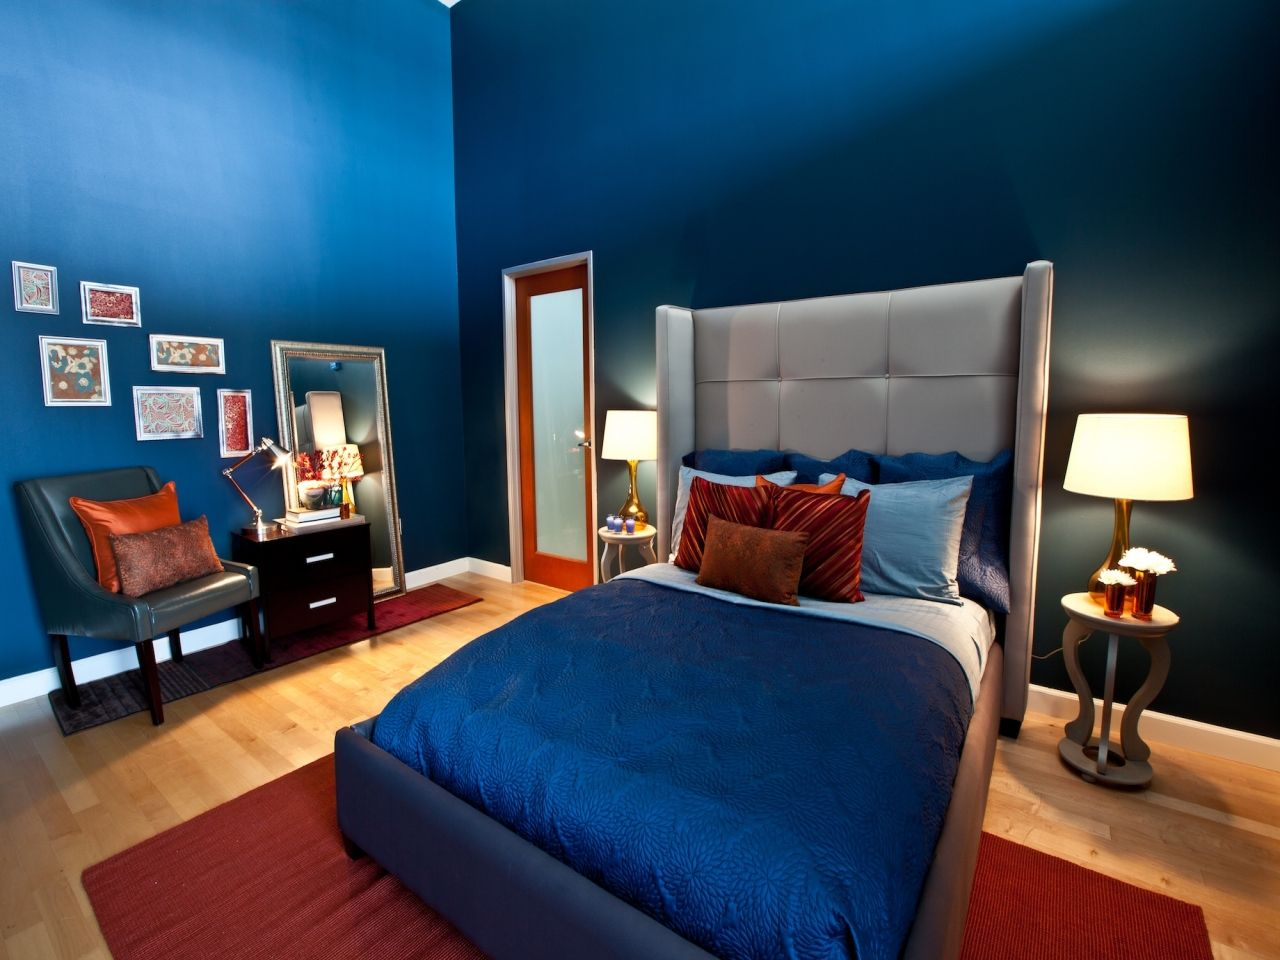 Best Color For Bedroom Walls For Boys